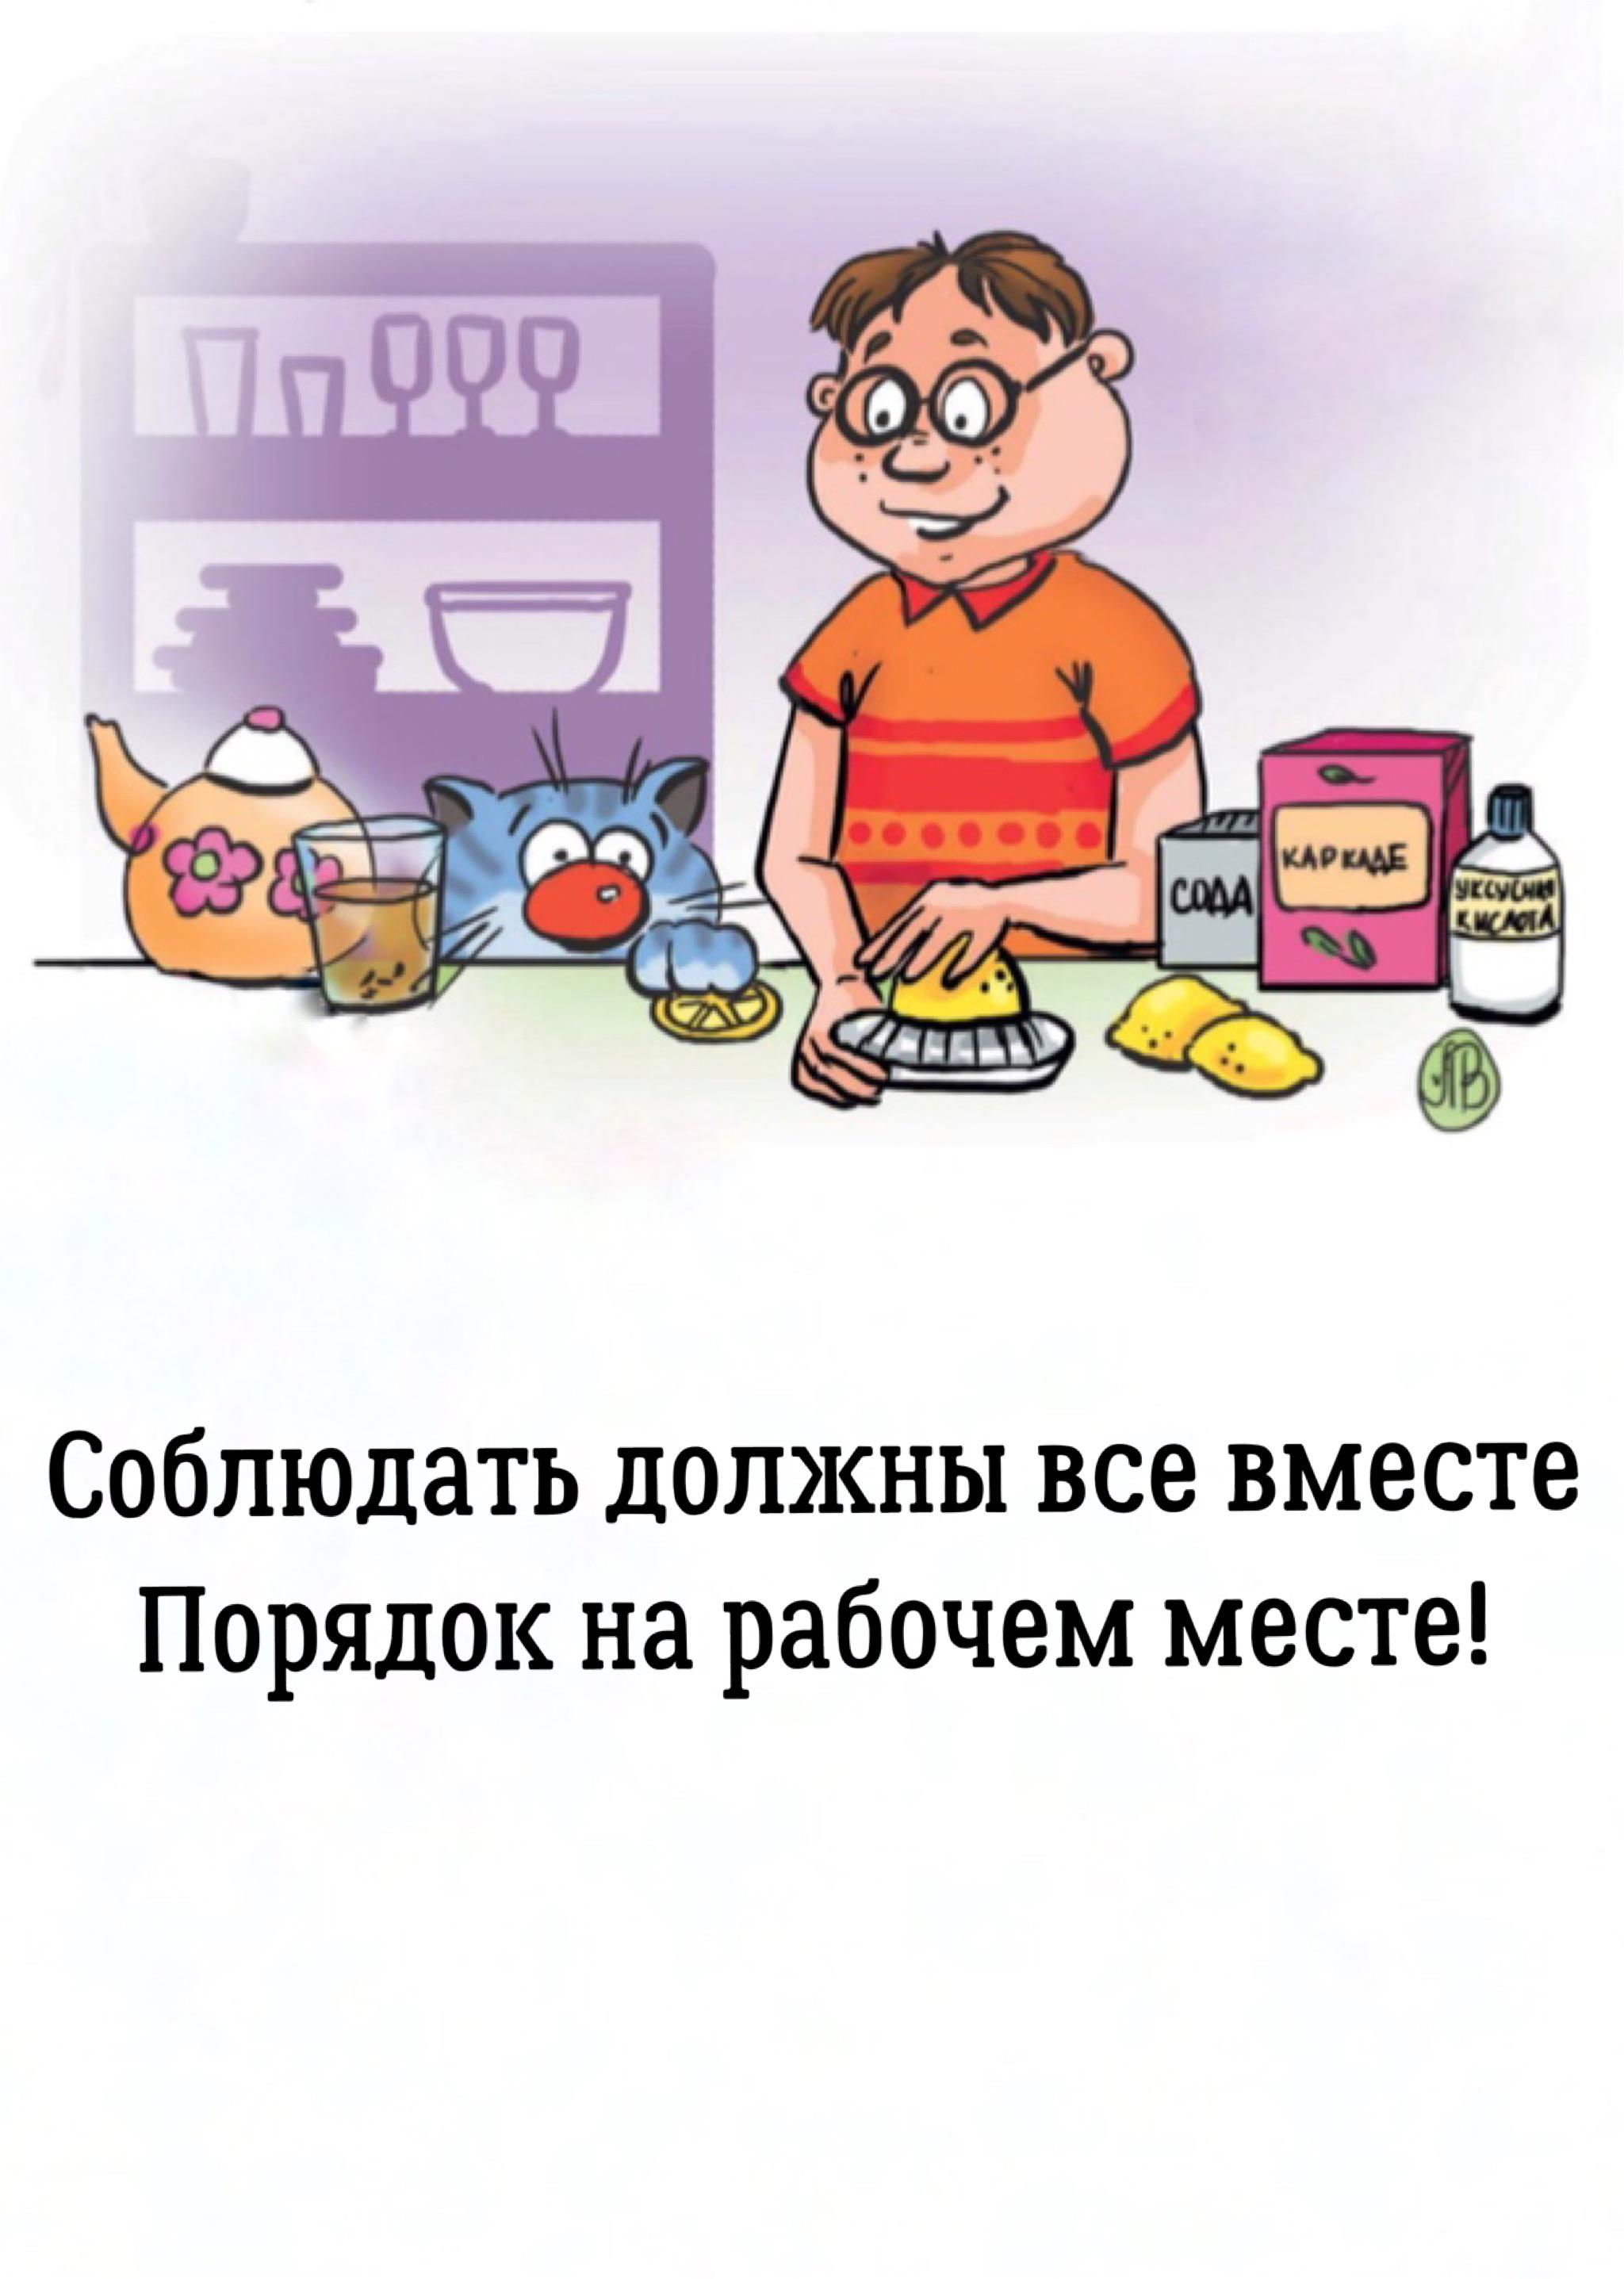 hello_html_27186cc1.jpg